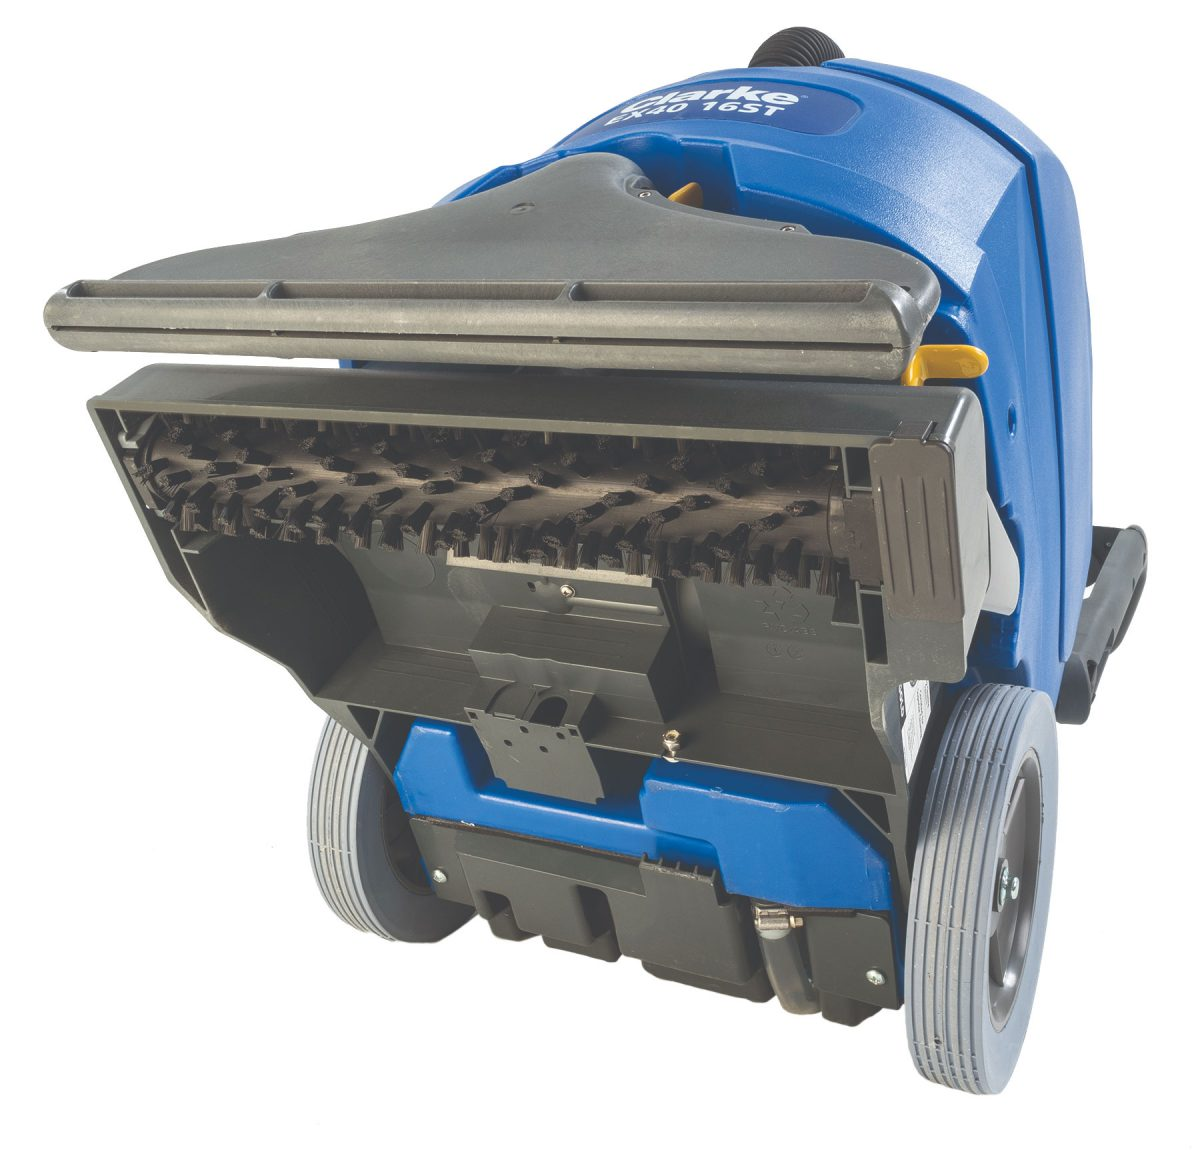 Clarke EX40 16ST Carpet Extractor